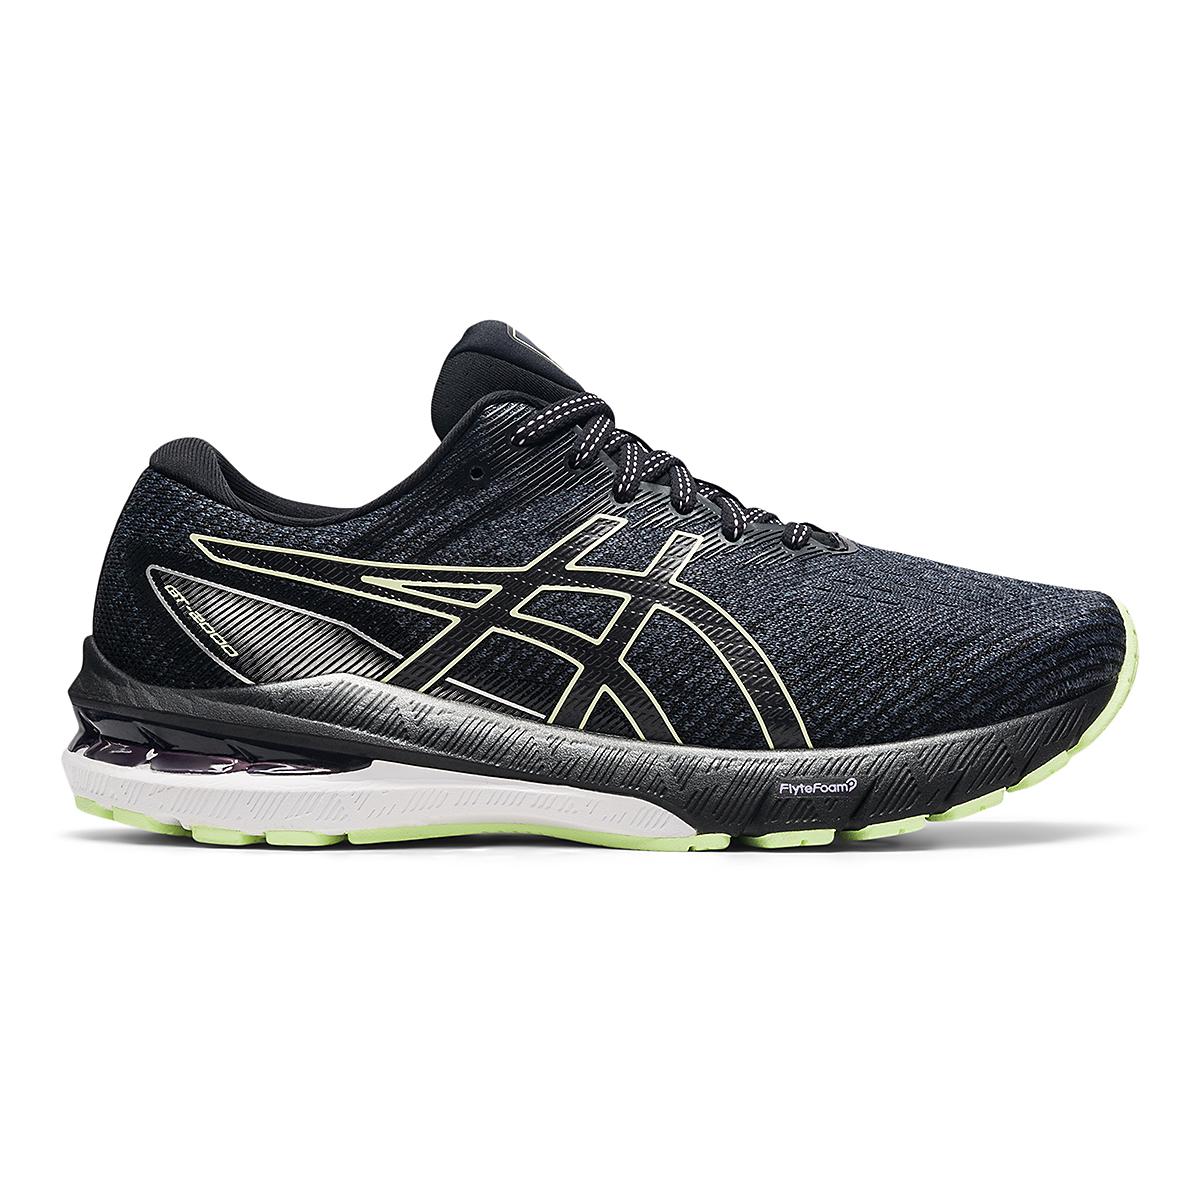 Women's Asics GT-2000 10 Running Shoe - Color: Soft Lavender/Black - Size: 5 - Width: Wide, Soft Lavender/Black, large, image 1